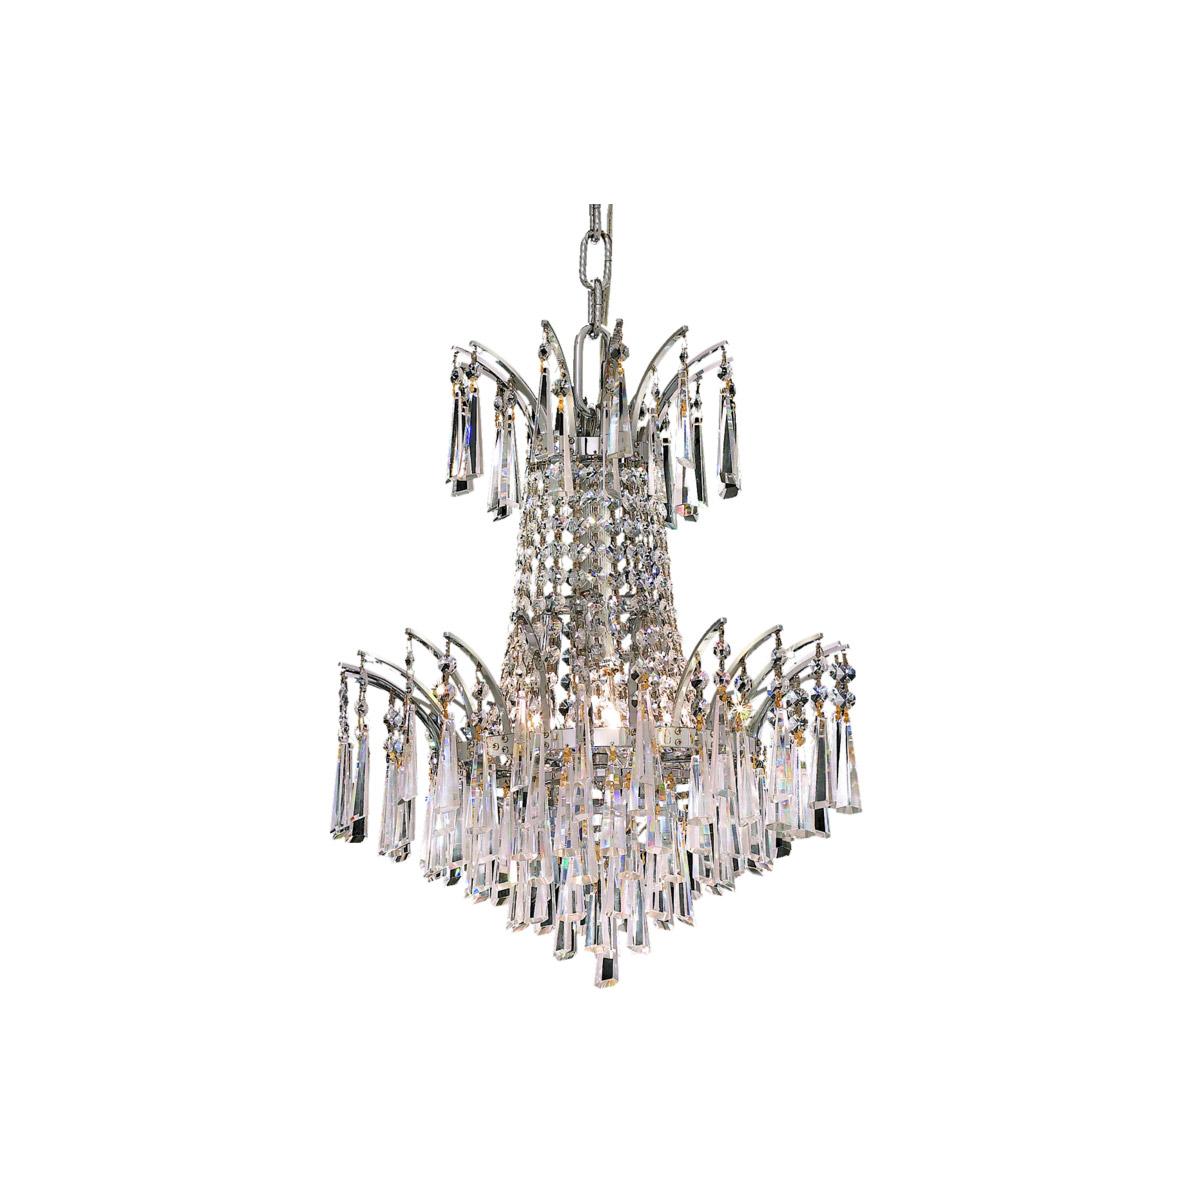 Details About 4 LIGHT 16 CRYSTAL CHANDELIER DINING LIVING ROOM BEDROOM LIGHTING LAMP FIXTURE